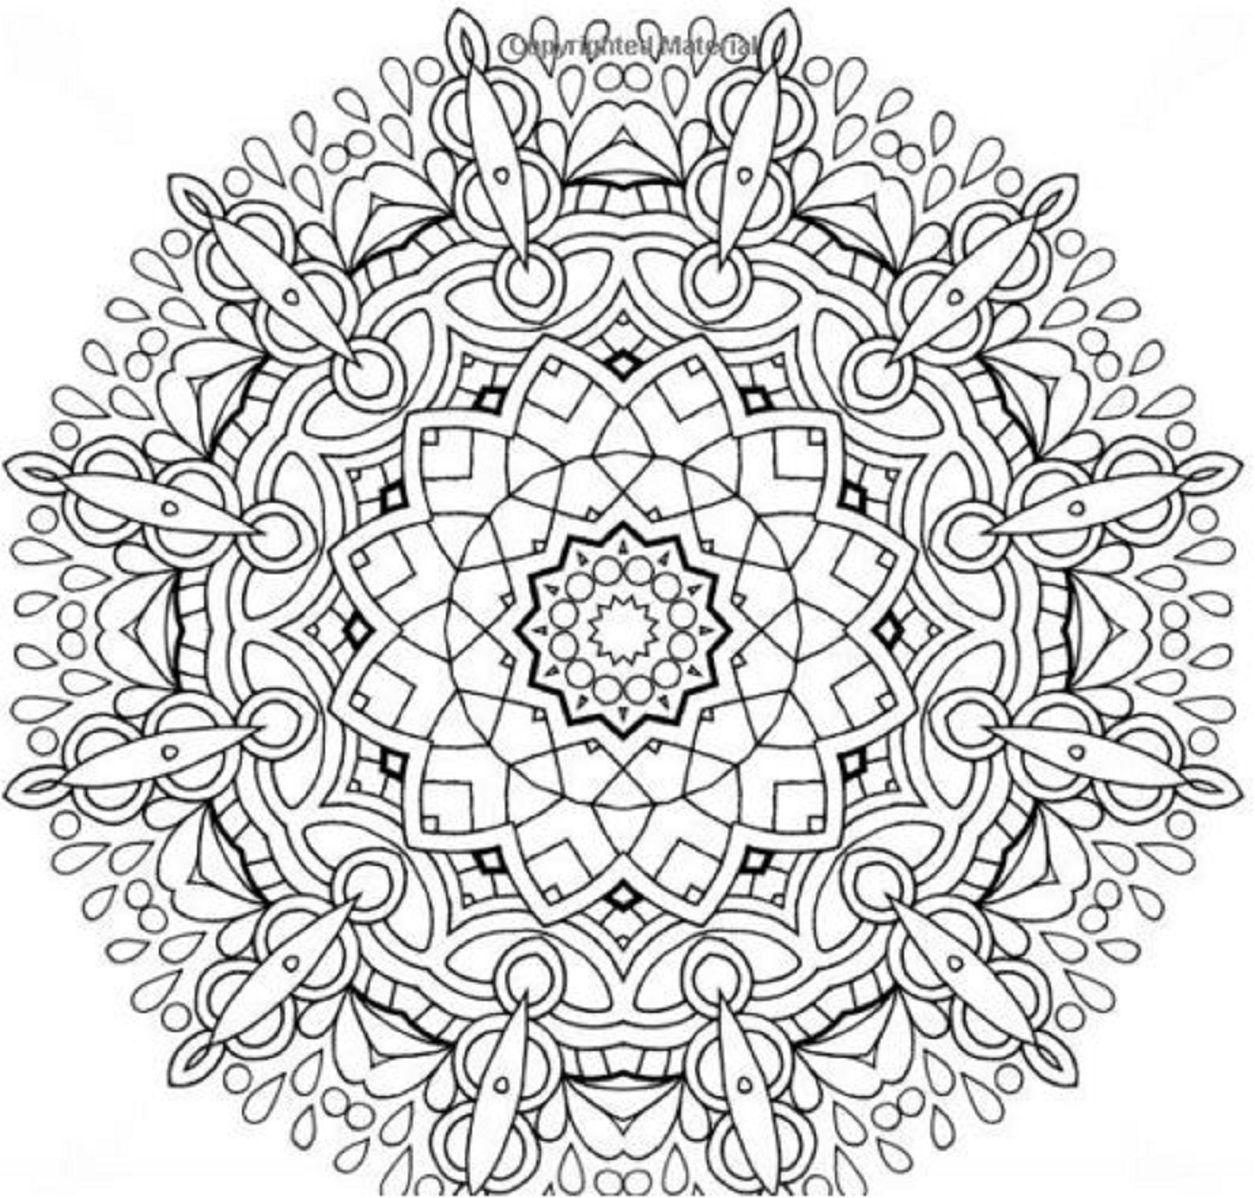 Mandala Stress Relief Coloring Book Snail Mandala Flower Free Hard